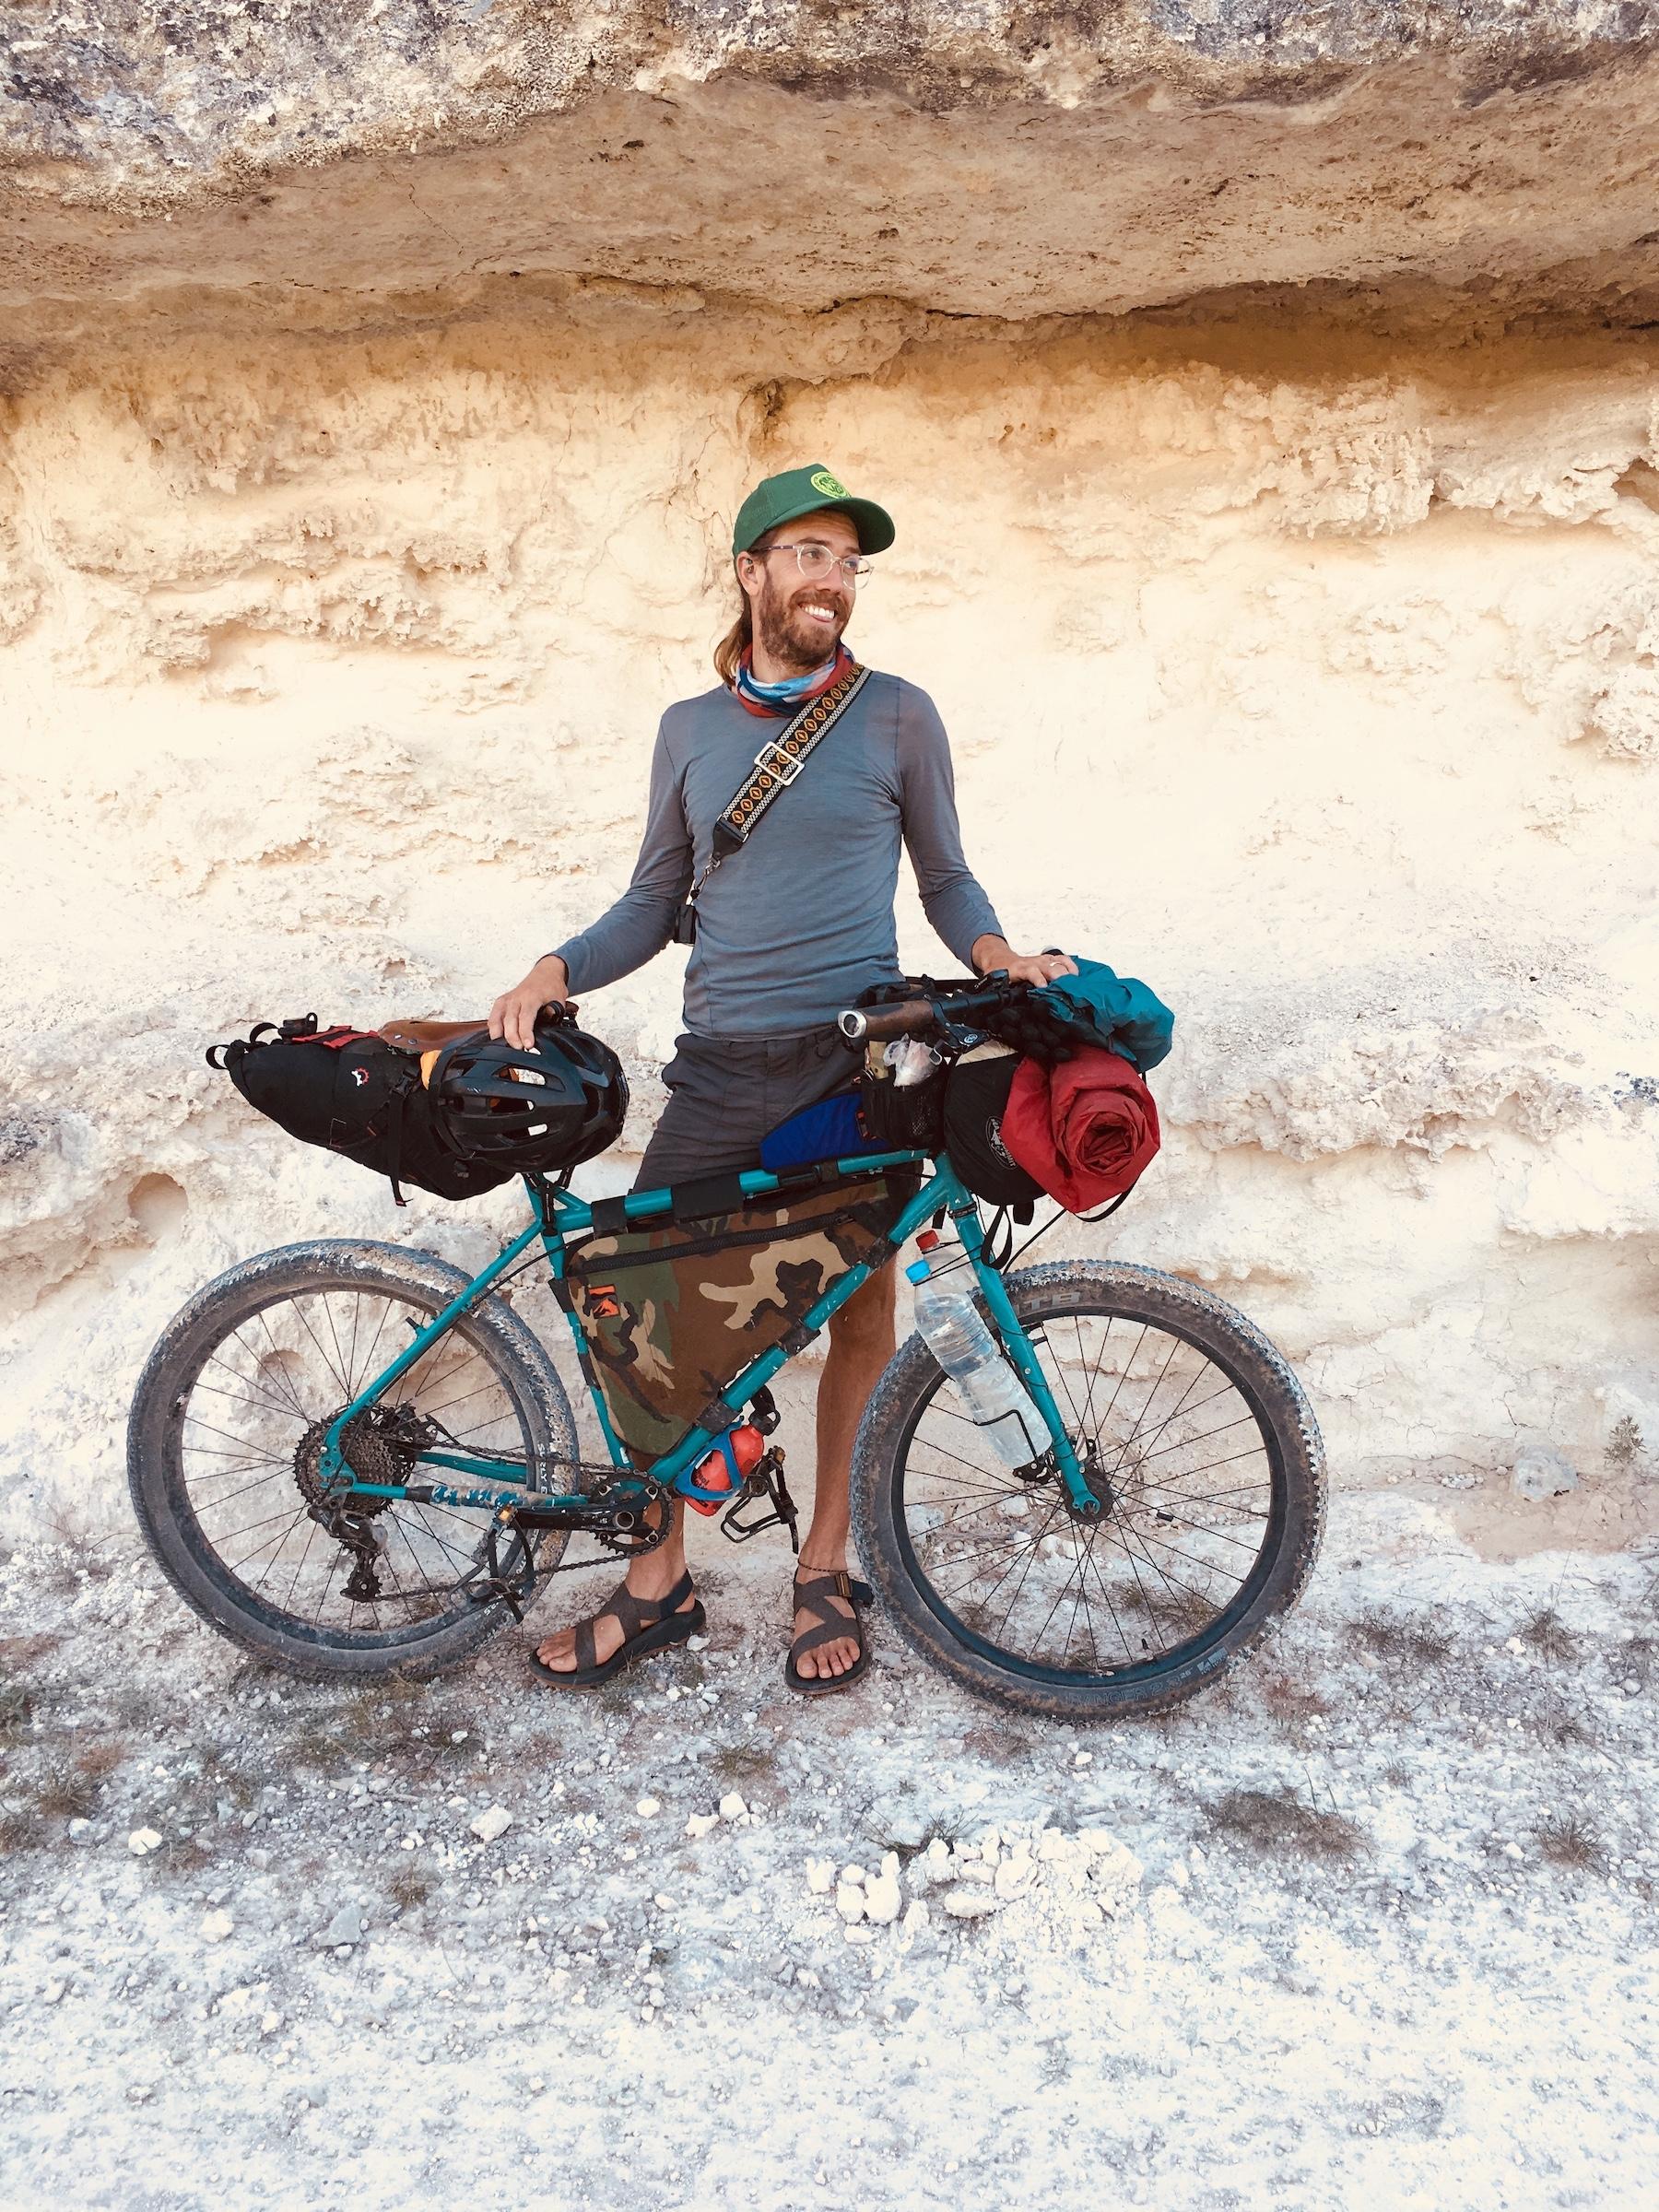 Henley's no stranger to bike packing